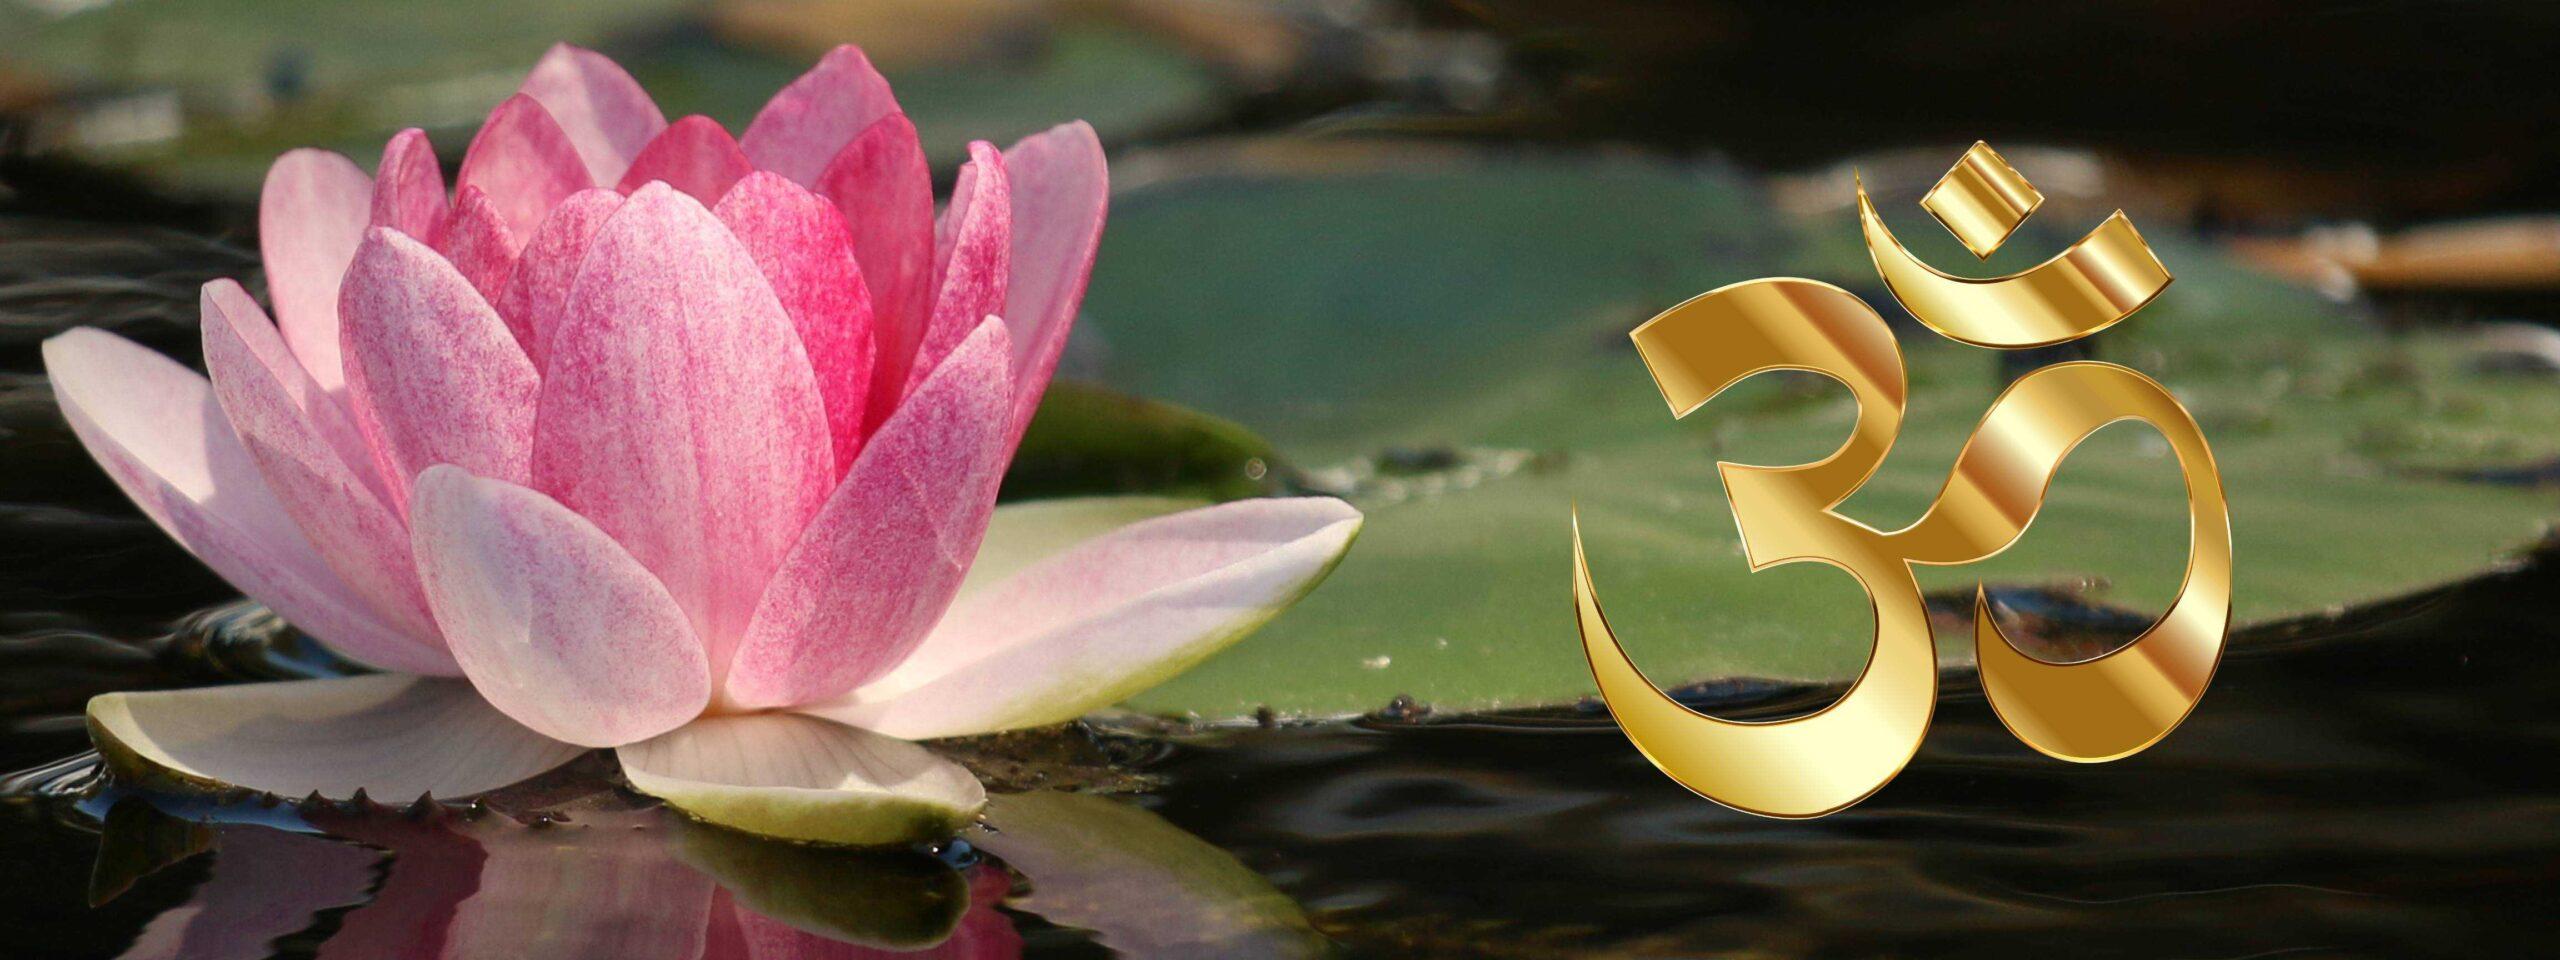 Rosa Lotusbleme neben einem goldenen OM